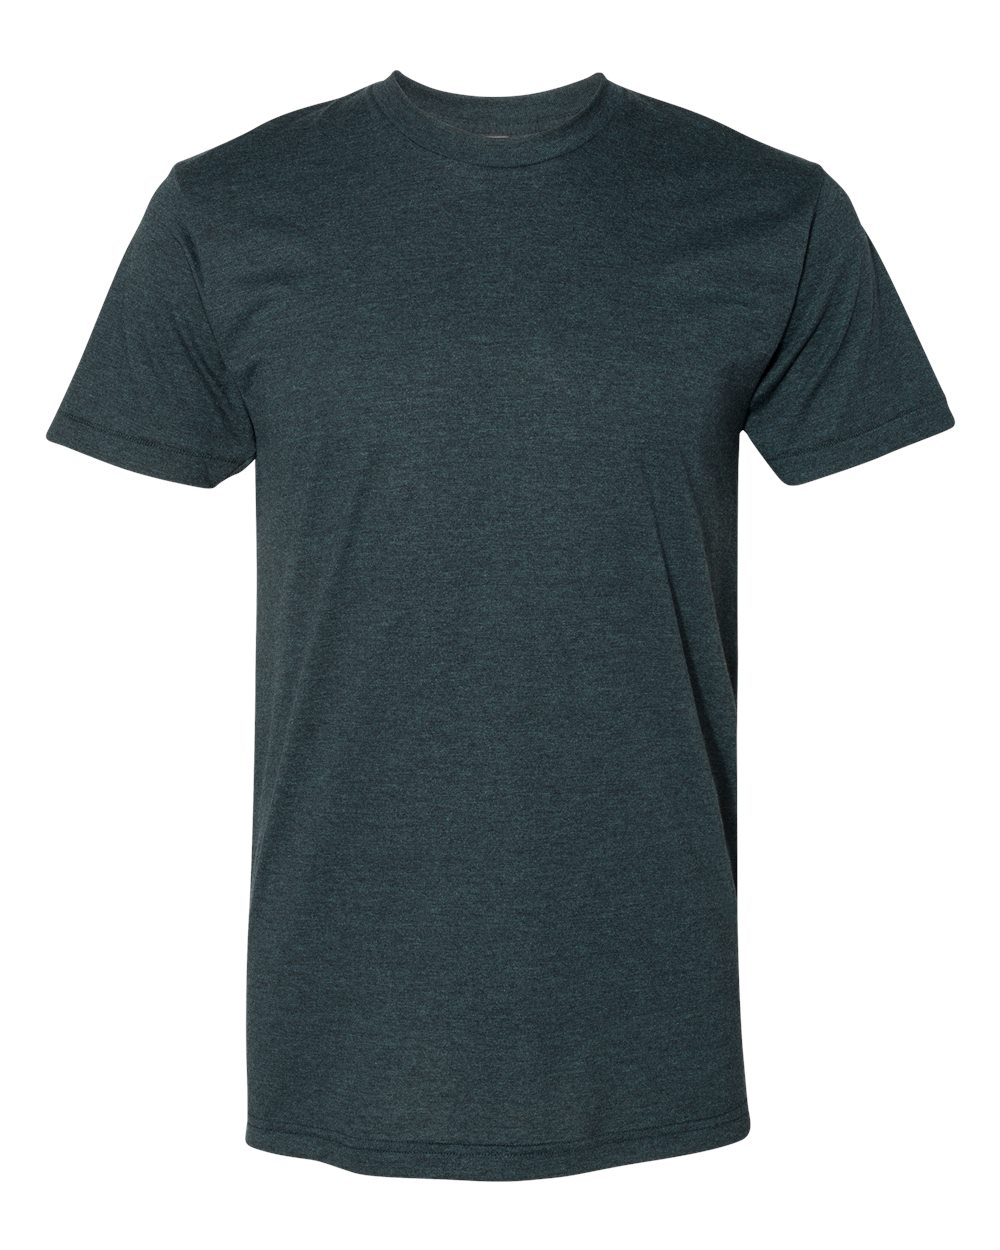 American-Apparel-Mens-Slim-Fit-50-50-Cotton-T-Shirt-Tee-BB401W-up-to-2XL thumbnail 12